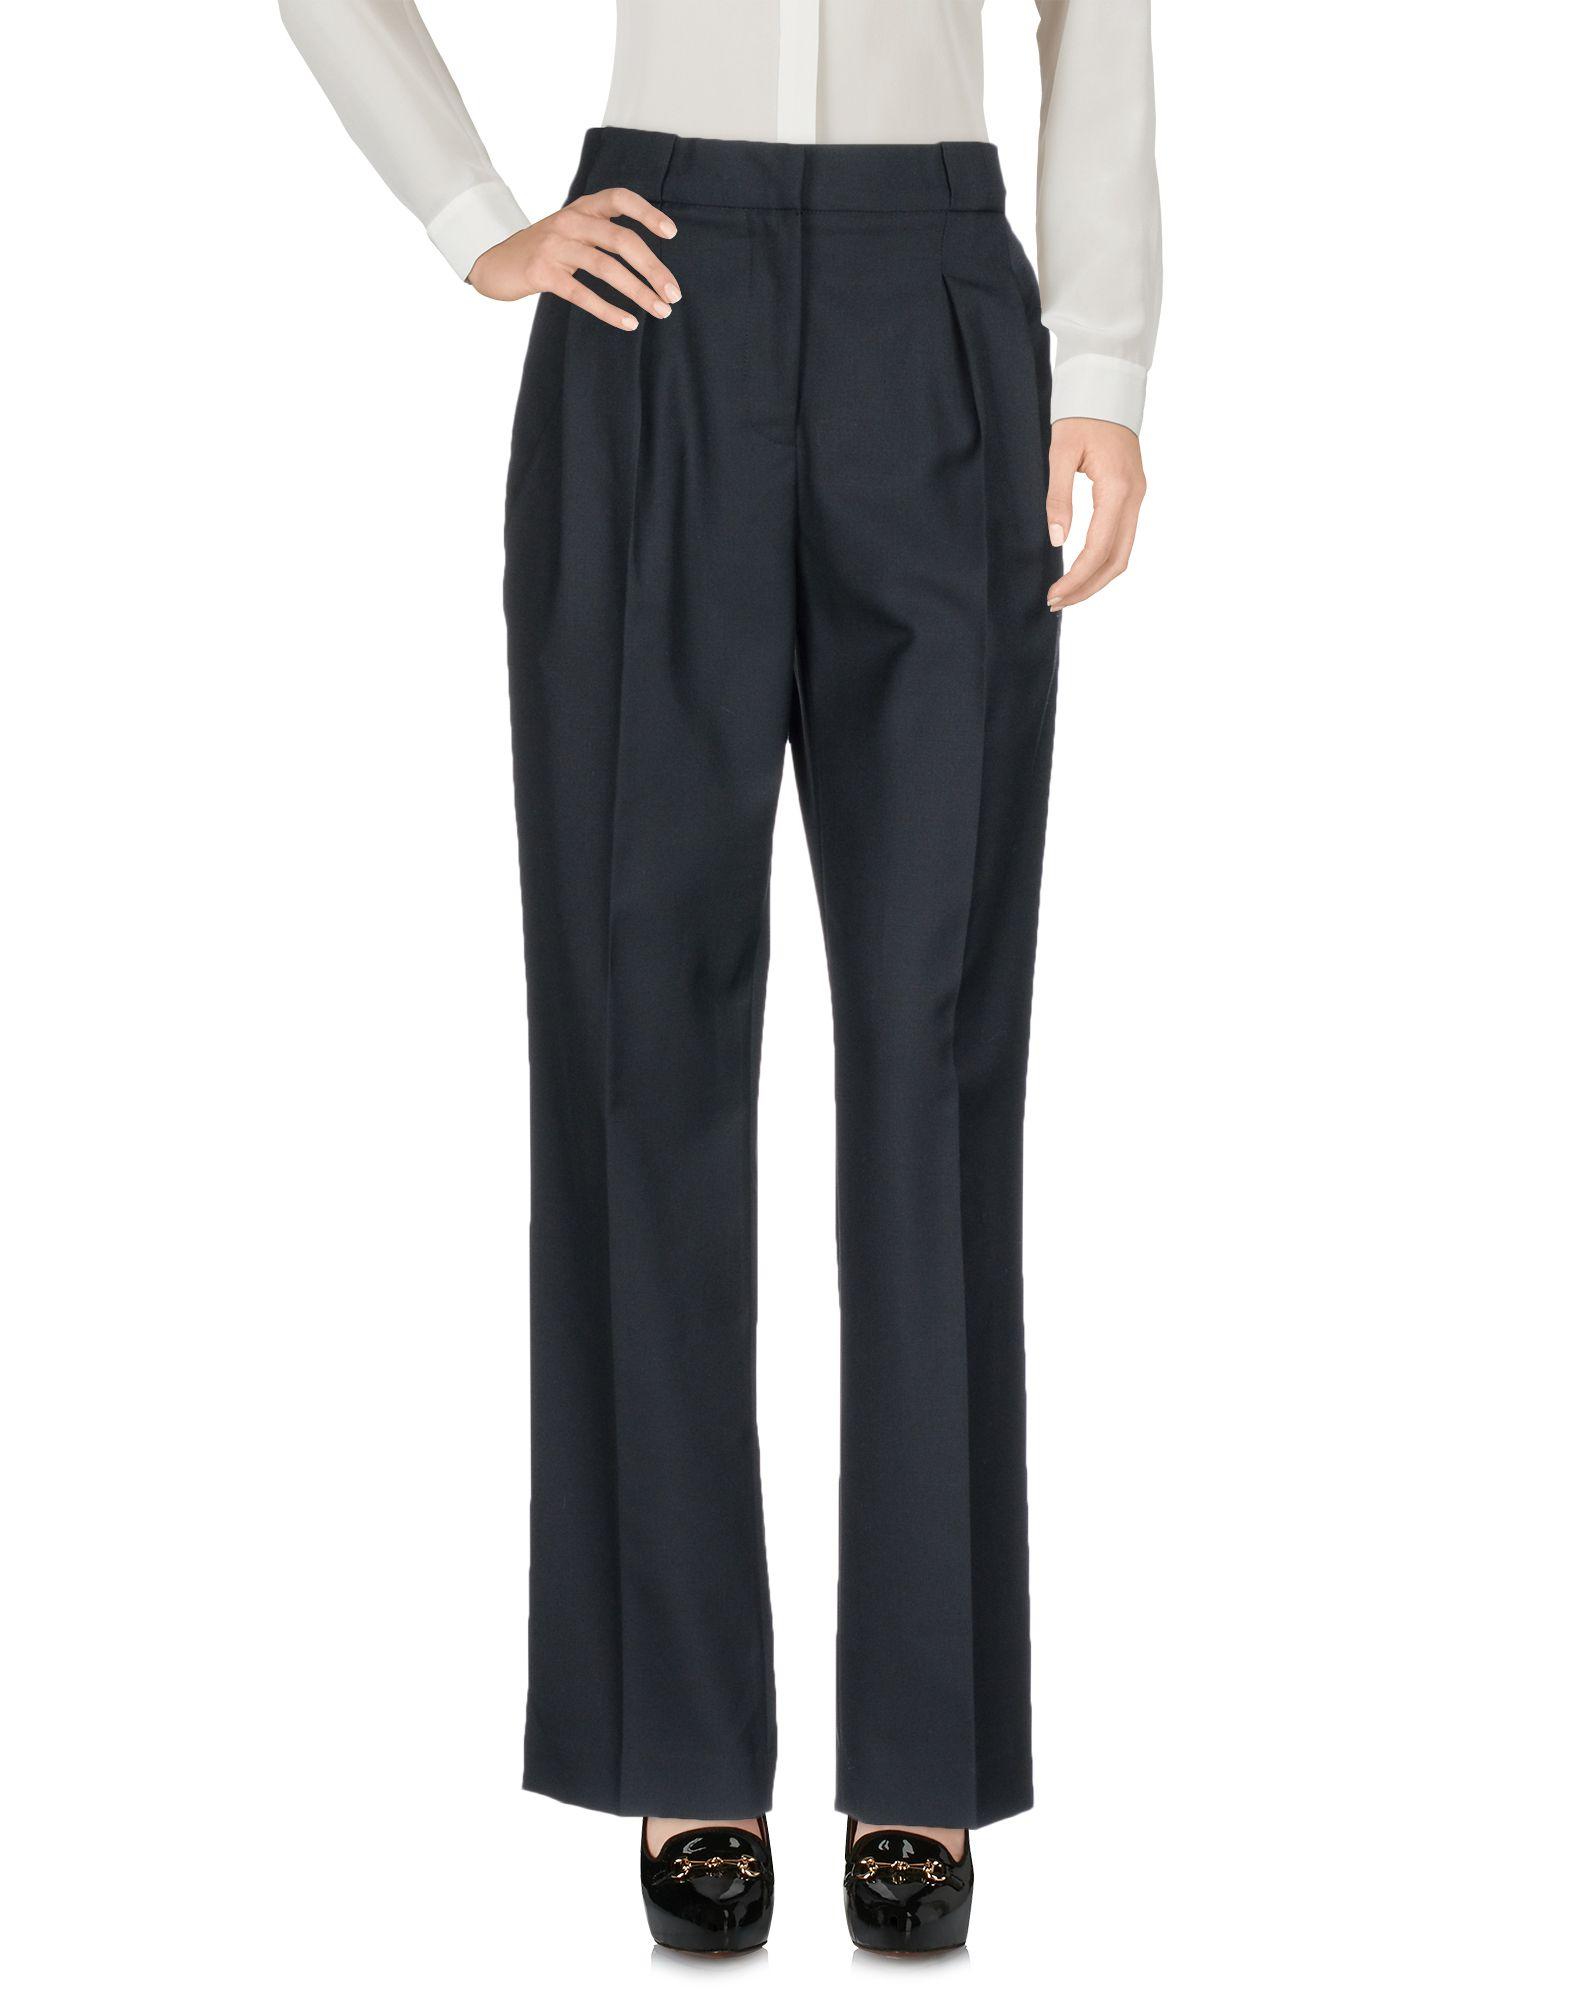 Pantalone Karl Lagerfeld Donna - Acquista online su 4QvLNdG